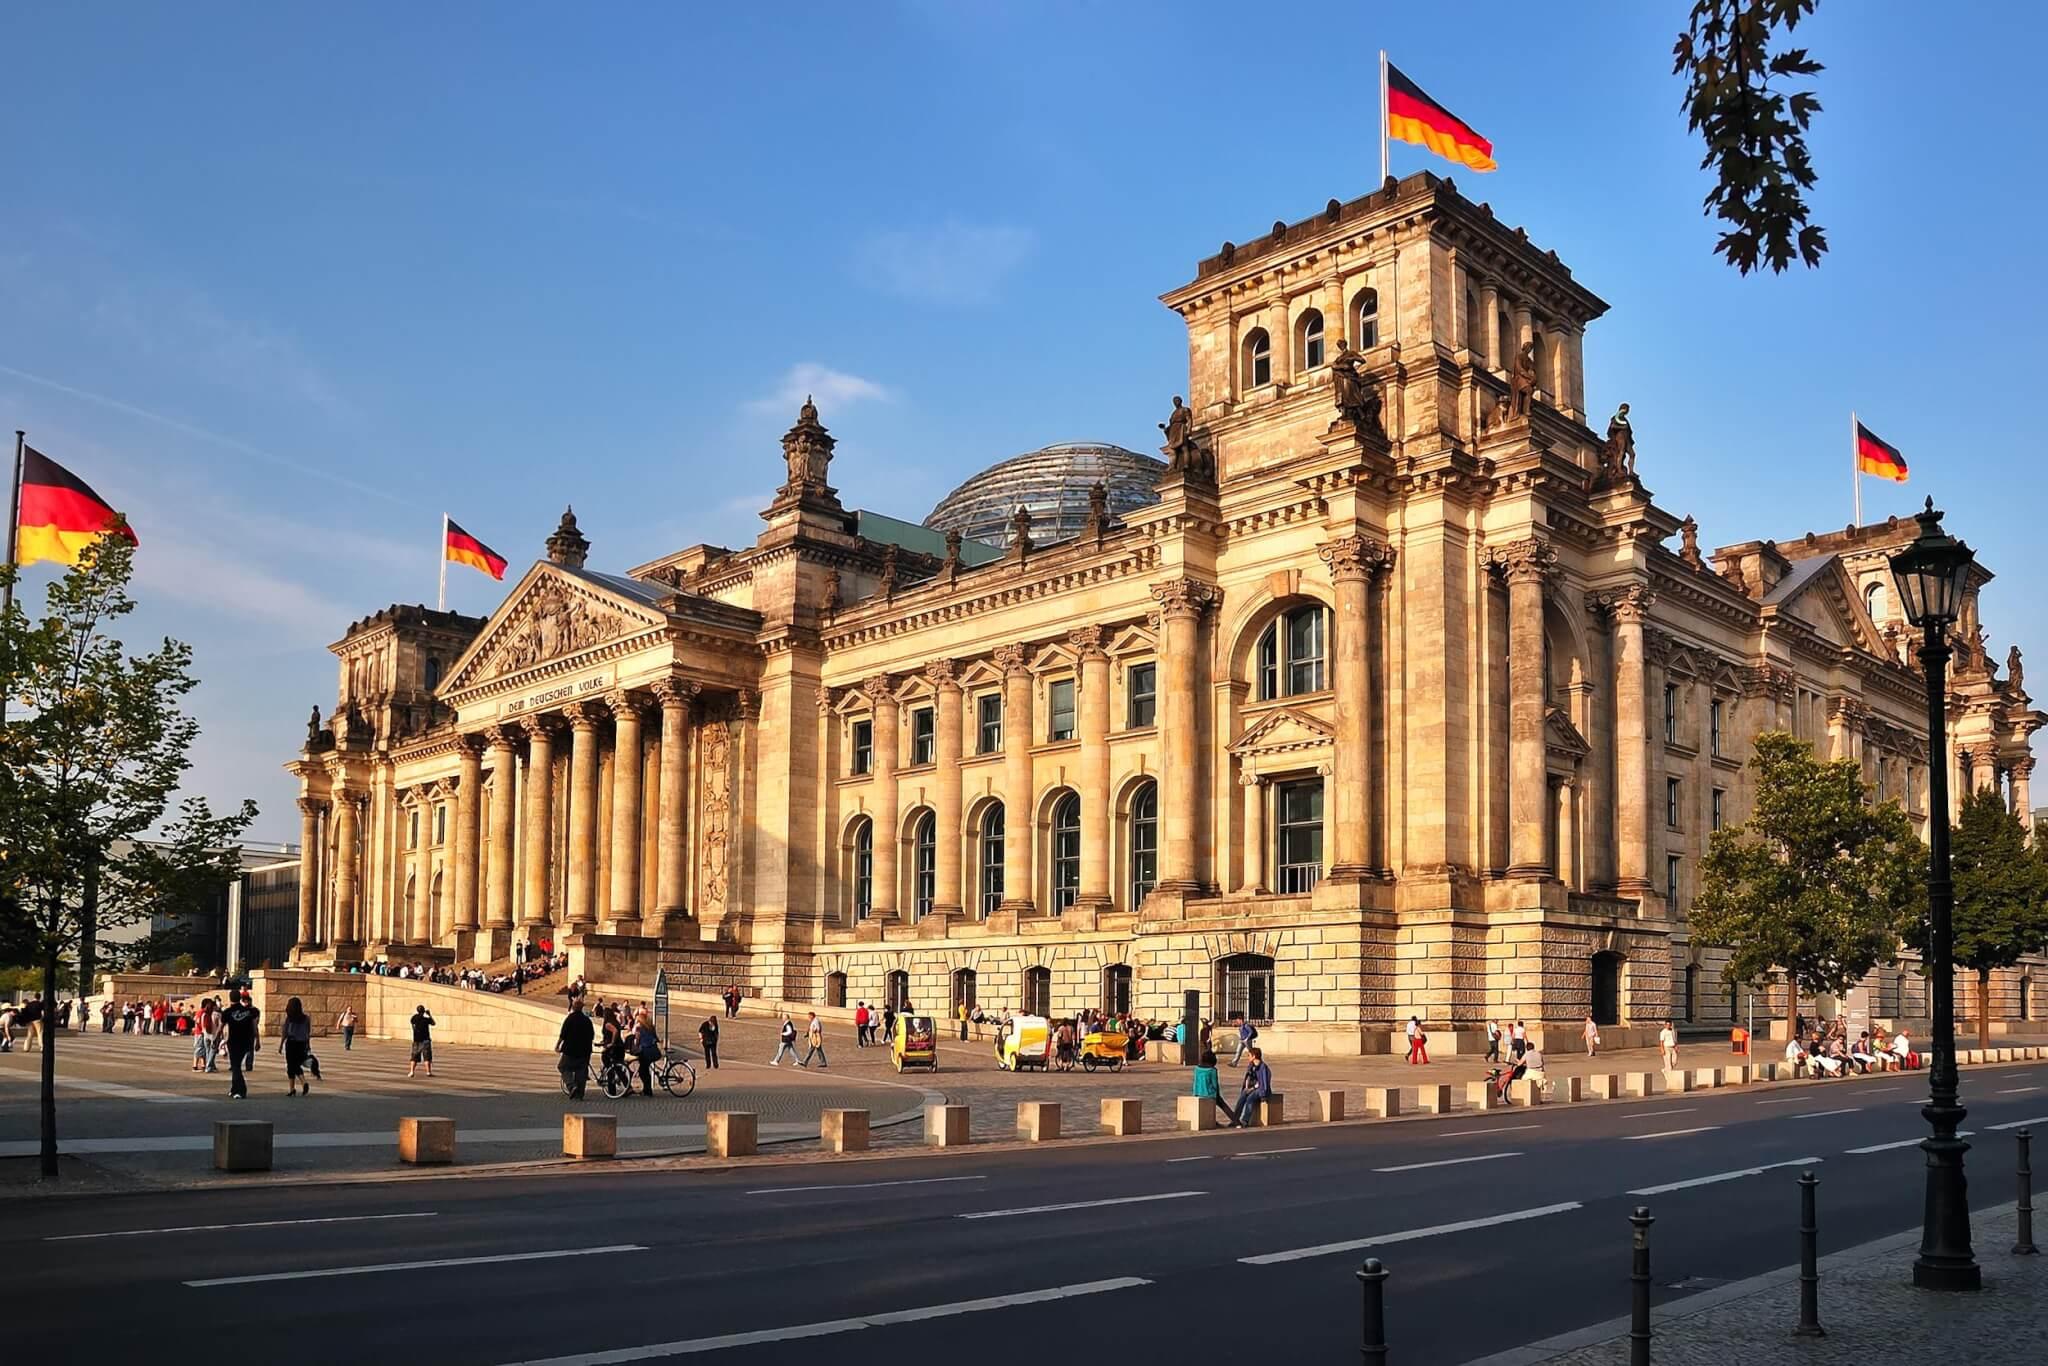 https://travelicious.bold-themes.com/main-demo/wp-content/uploads/sites/2/2018/09/destination-berlin-01.jpg